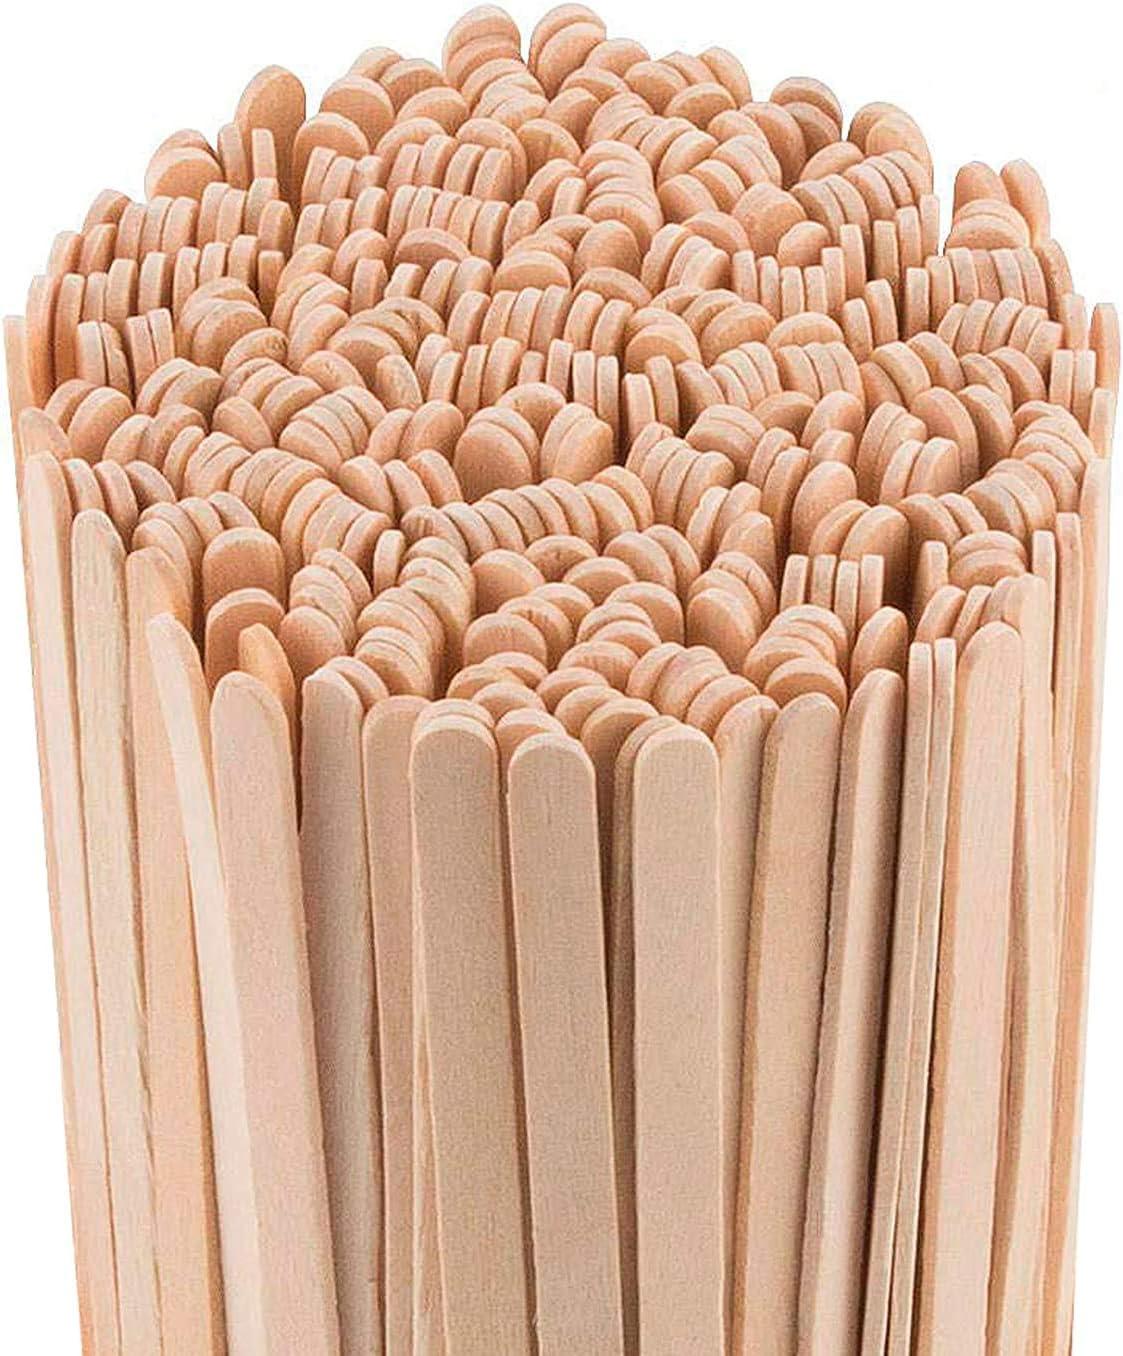 Daddy Chef Coffee Stirrers Sticks, Natural Birch Wood 1000 Count, 7.7